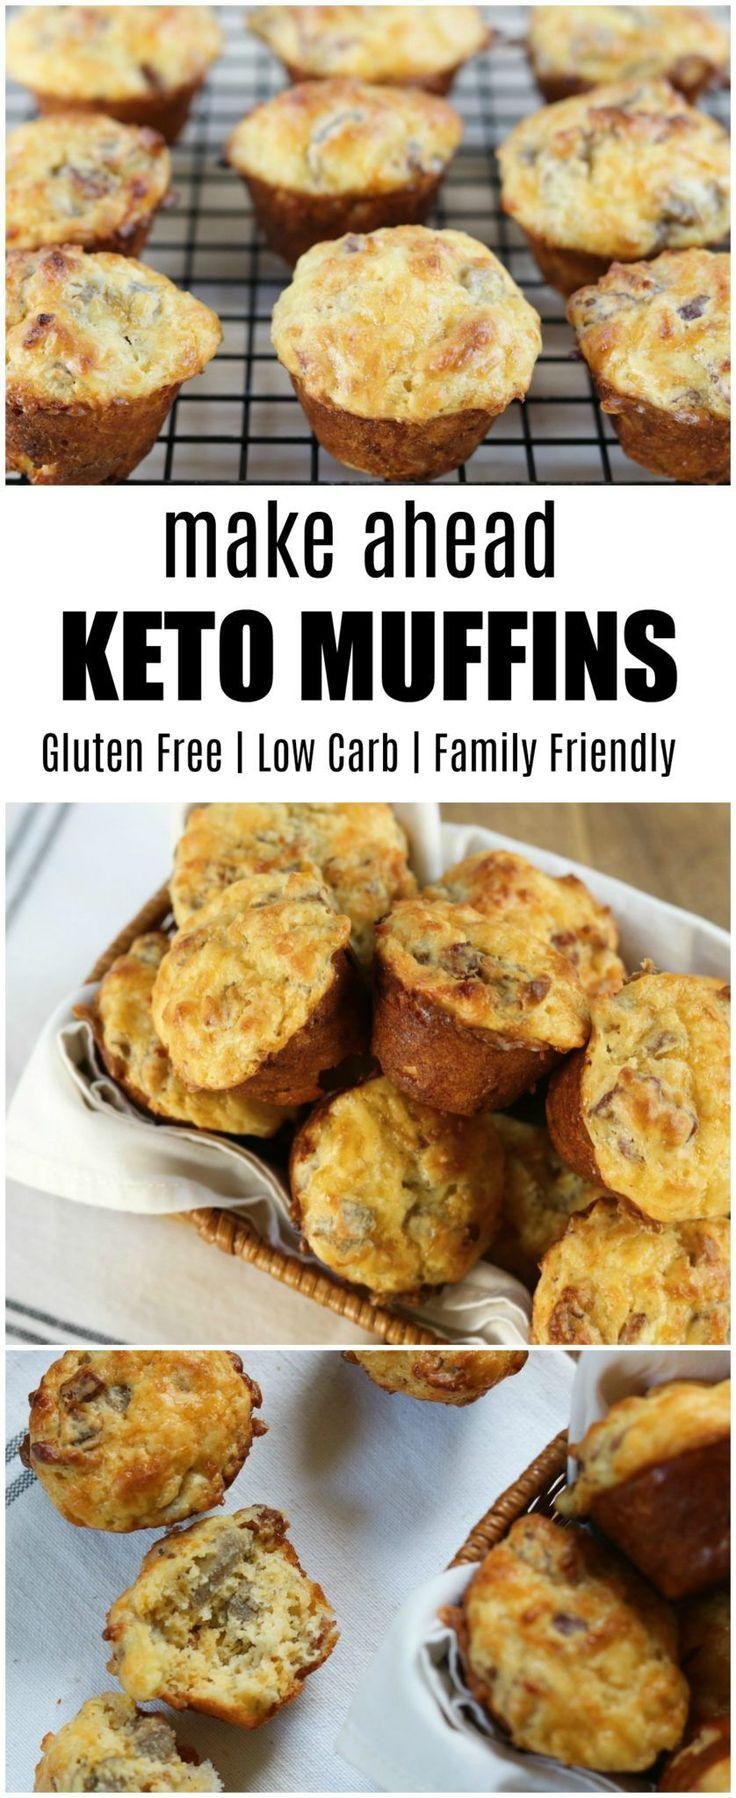 Keto Muffins Recipe & Video